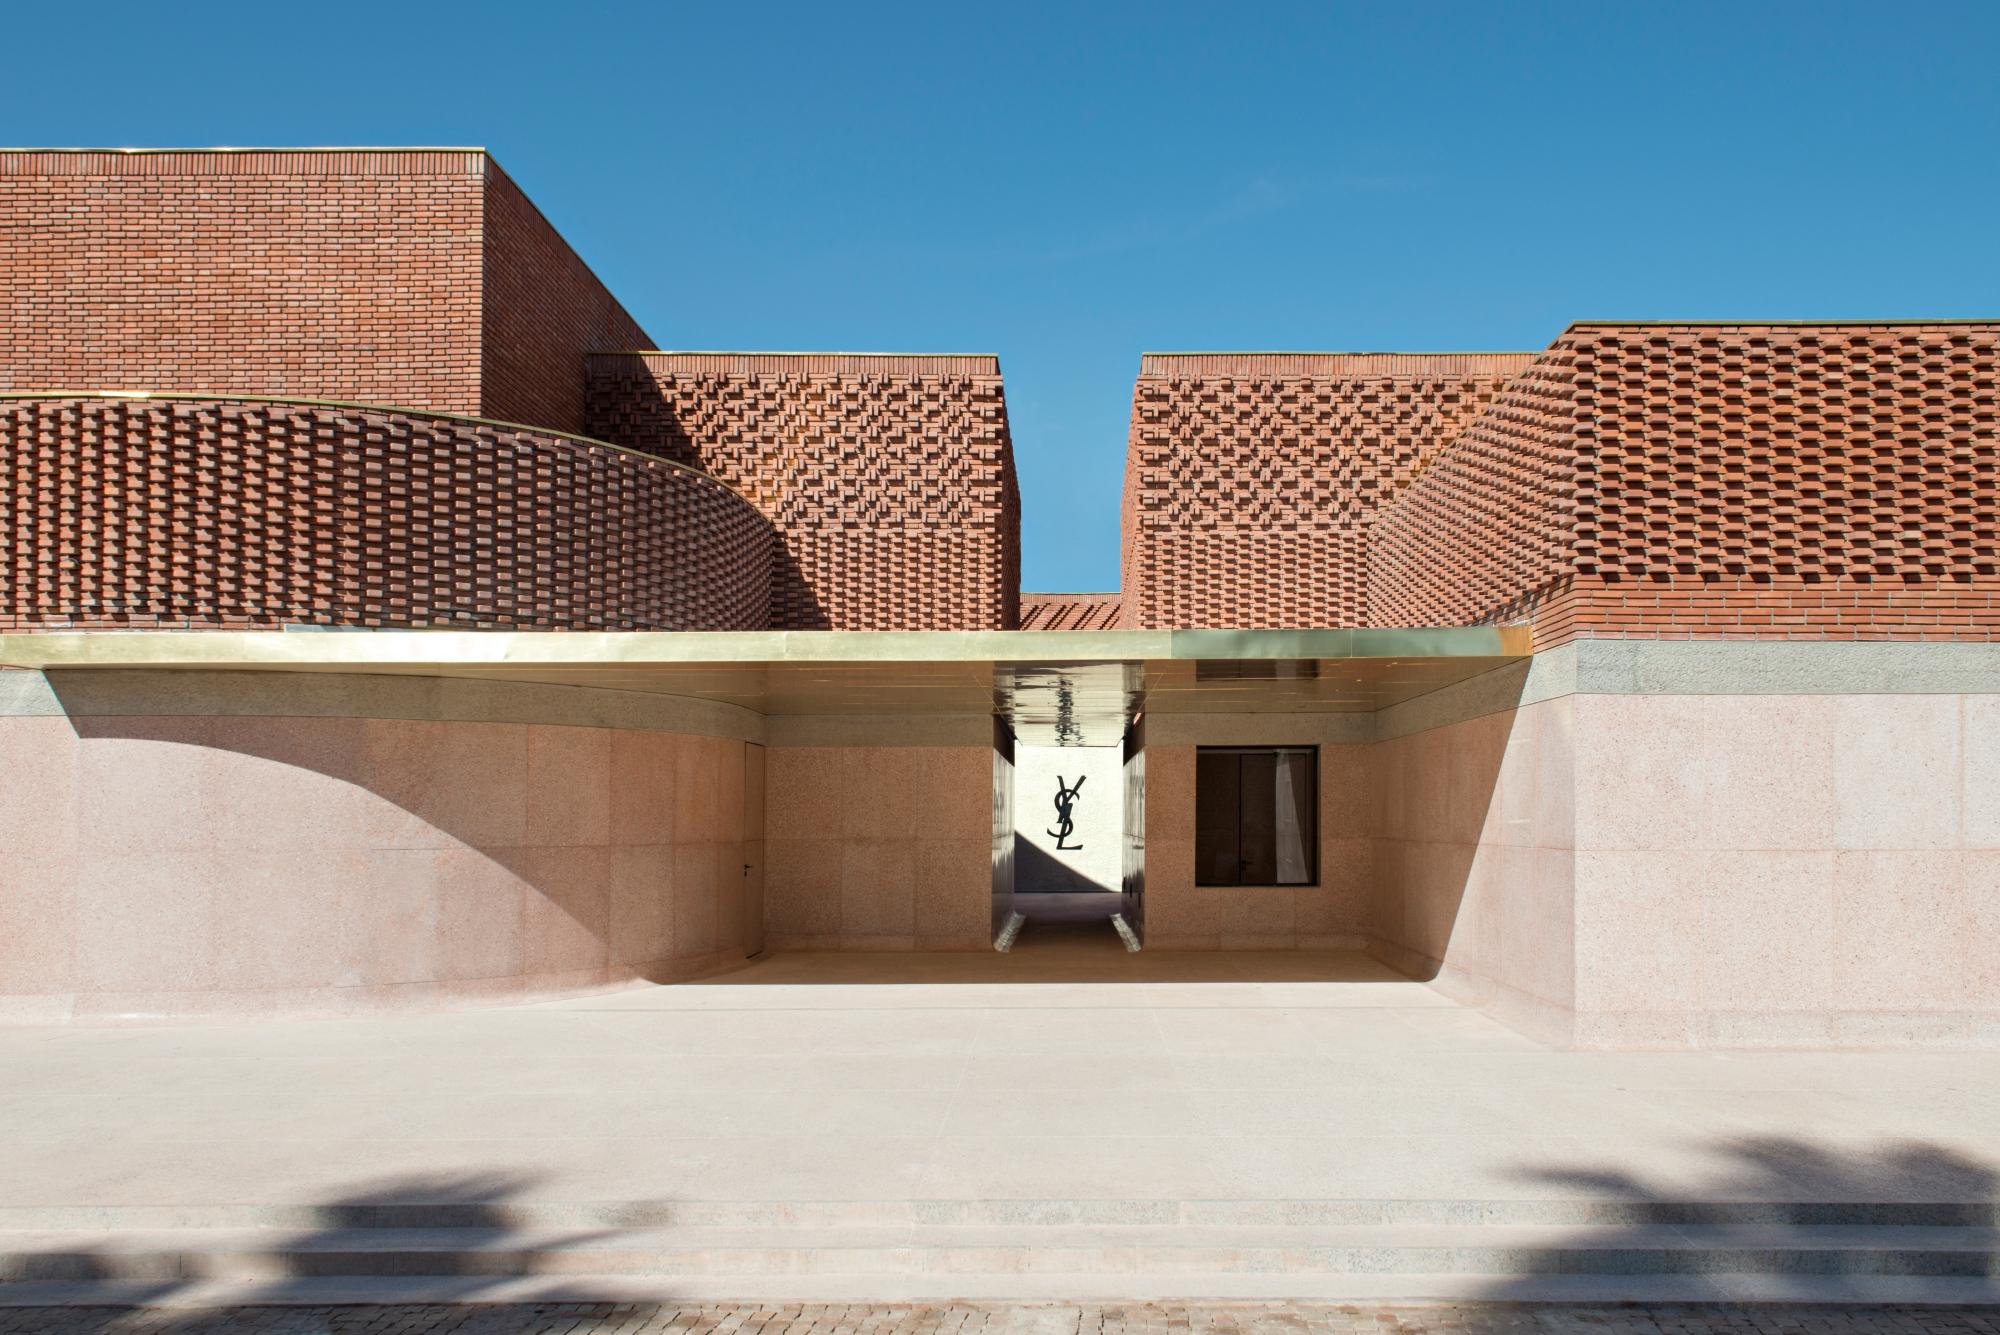 Ives Saint Laurent ma swoje muzeum w Maroku